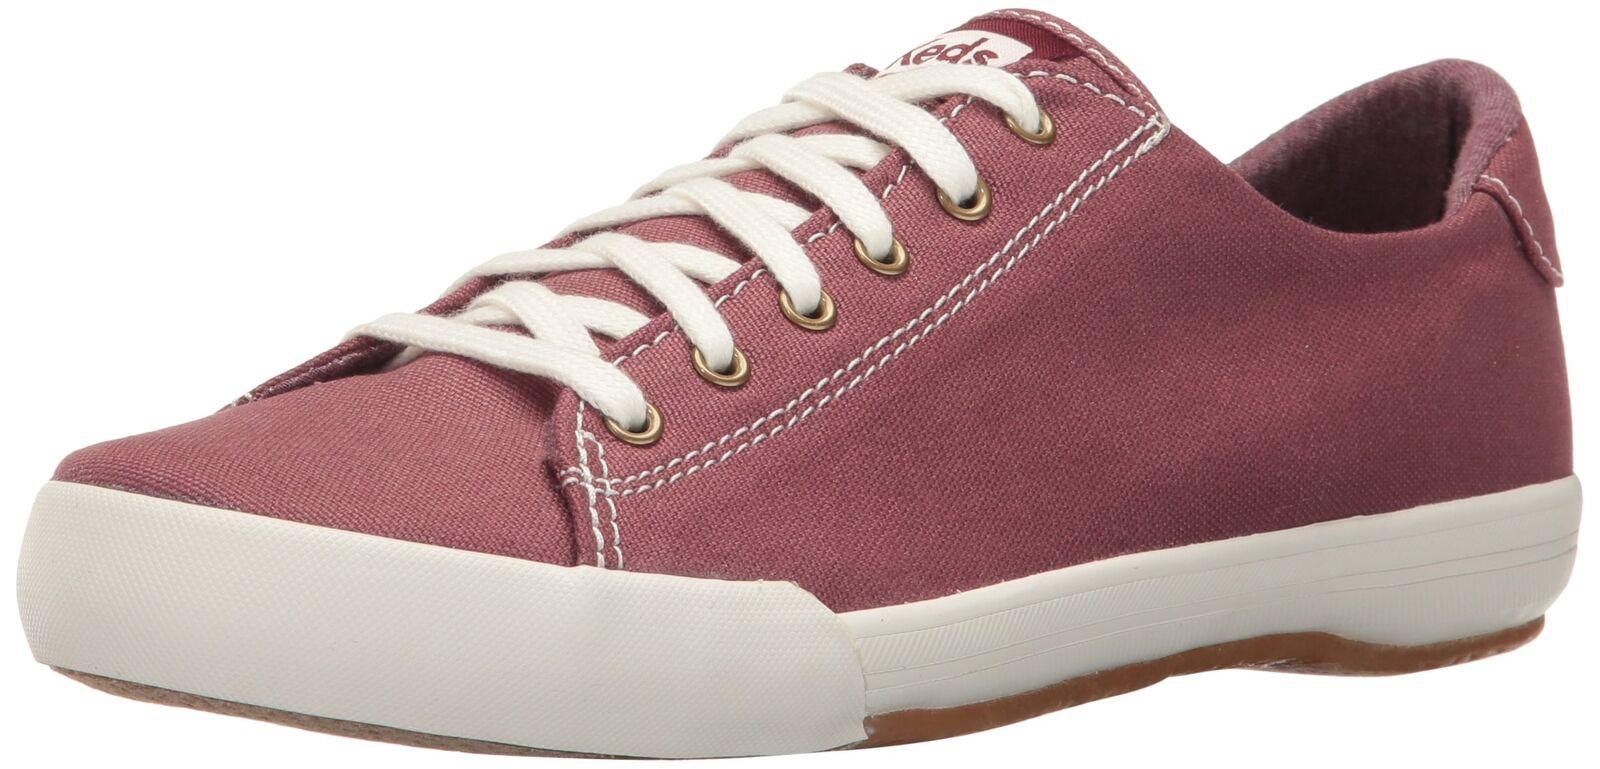 Keds Women's Lex LTT Fashion Sneaker Burgundy 7 B(M) US